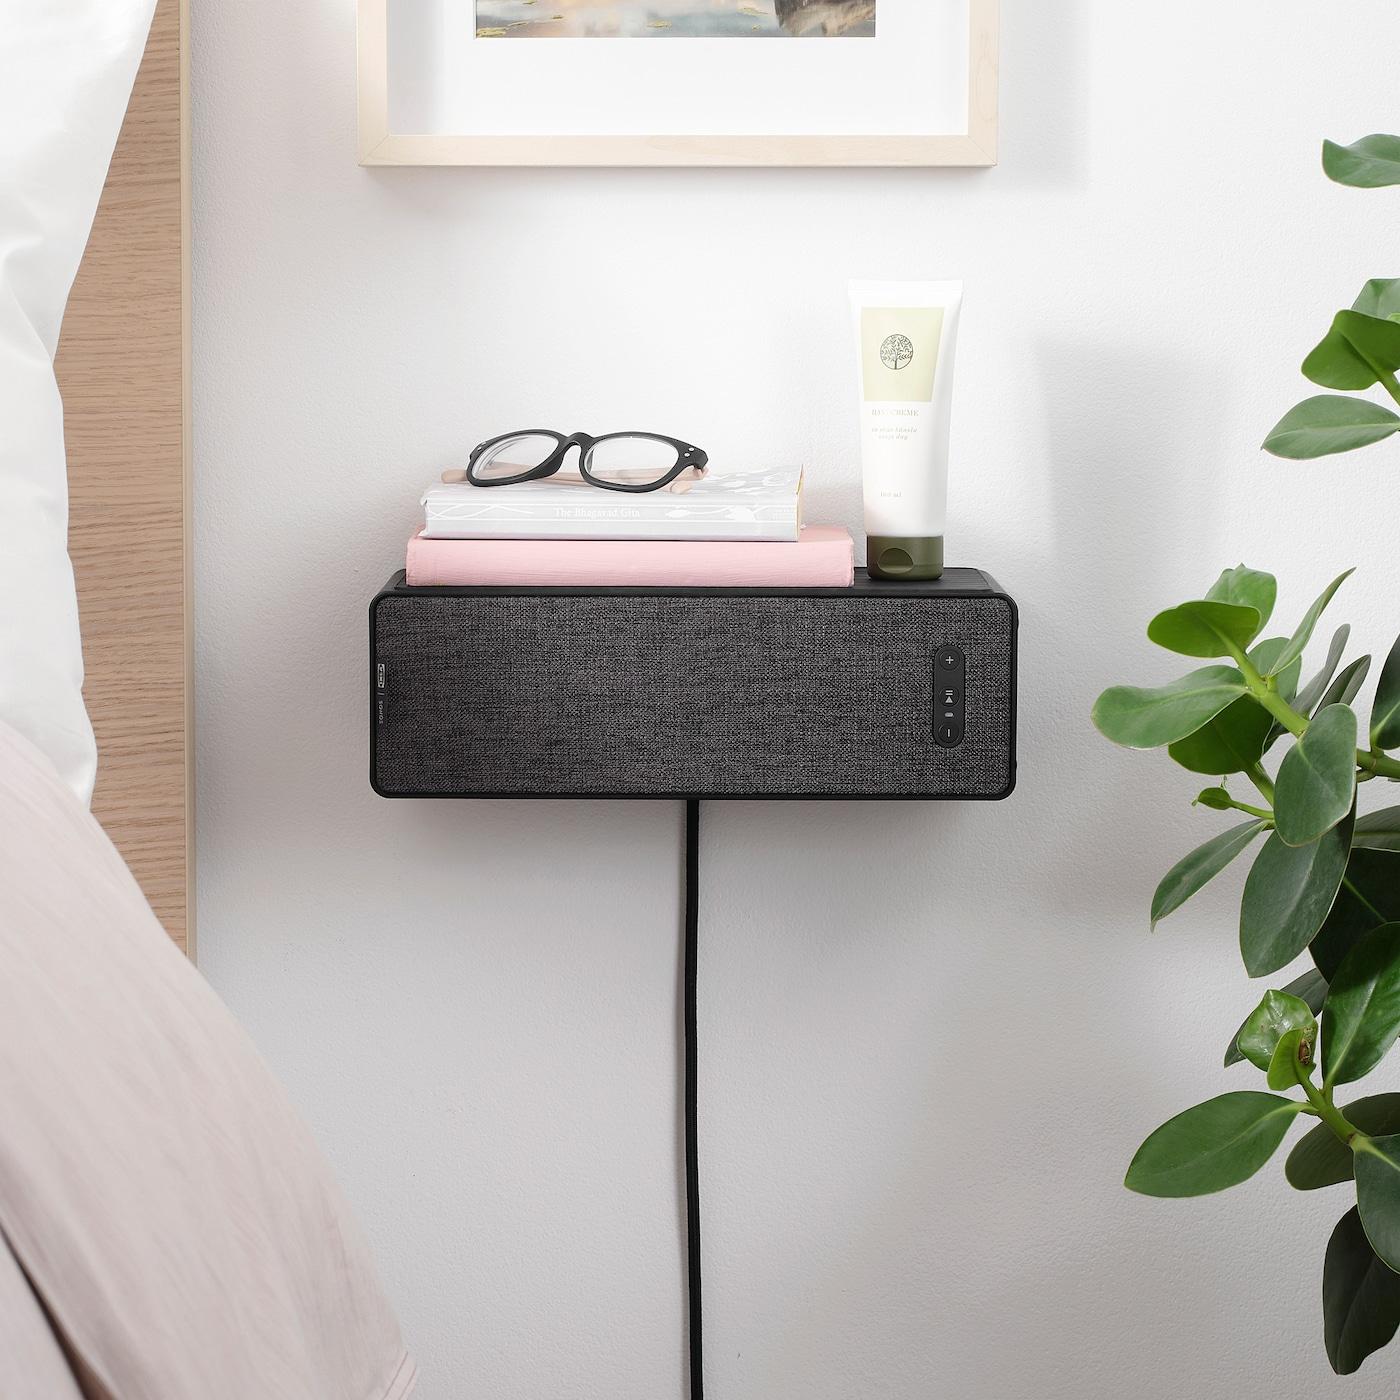 SYMFONISK Wifi-bokhyllehögtalare, svart